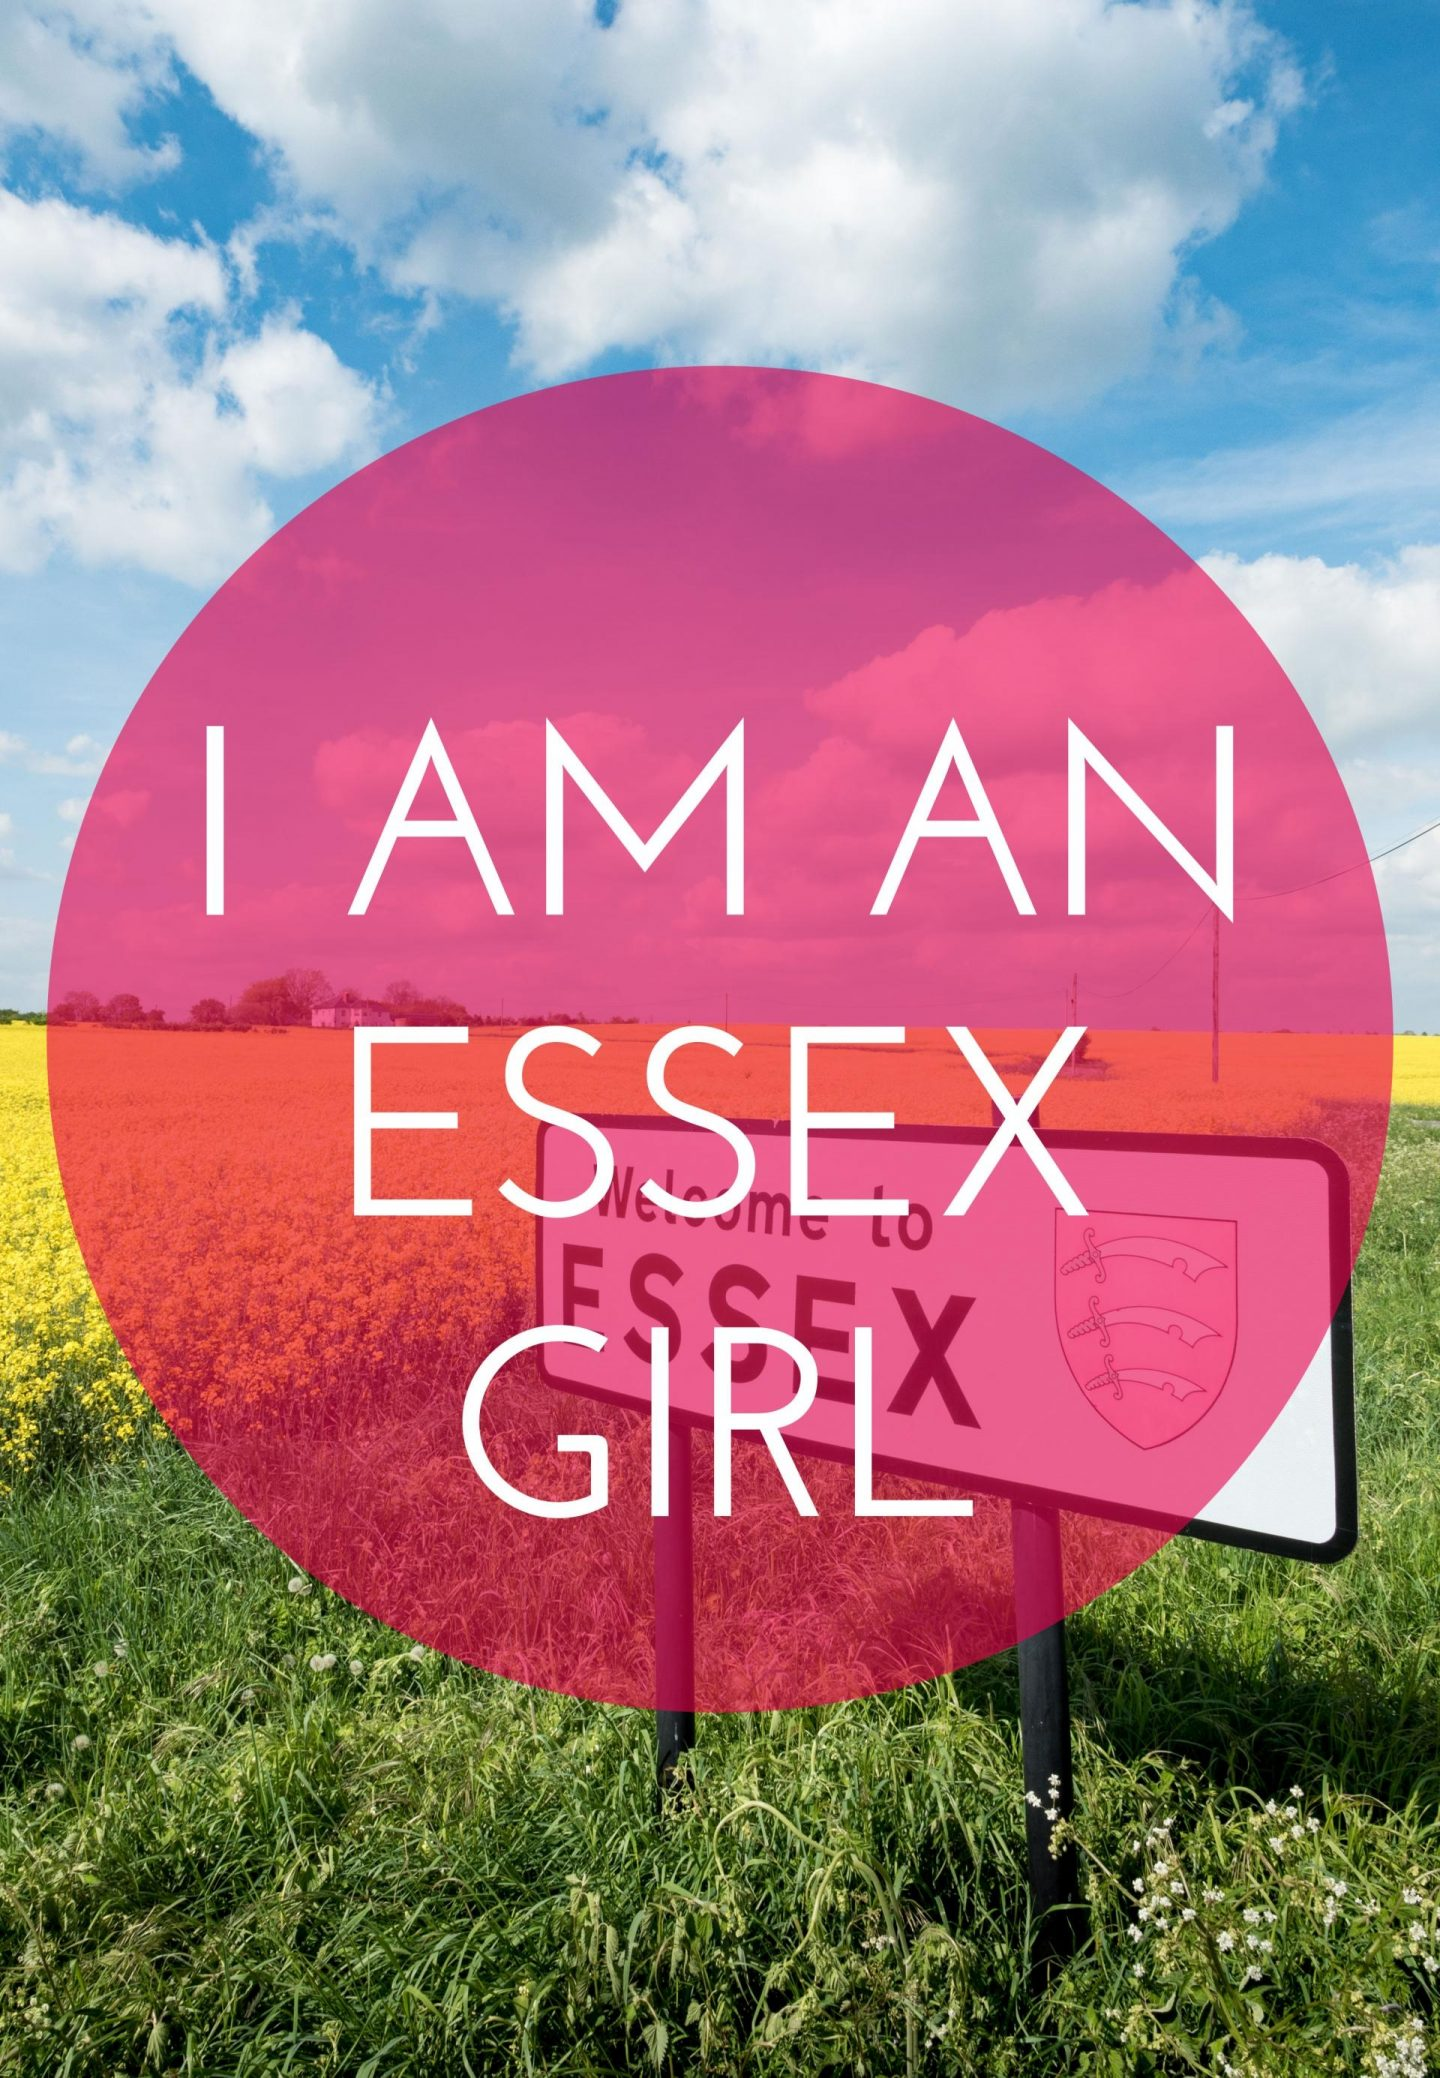 Essex Girl